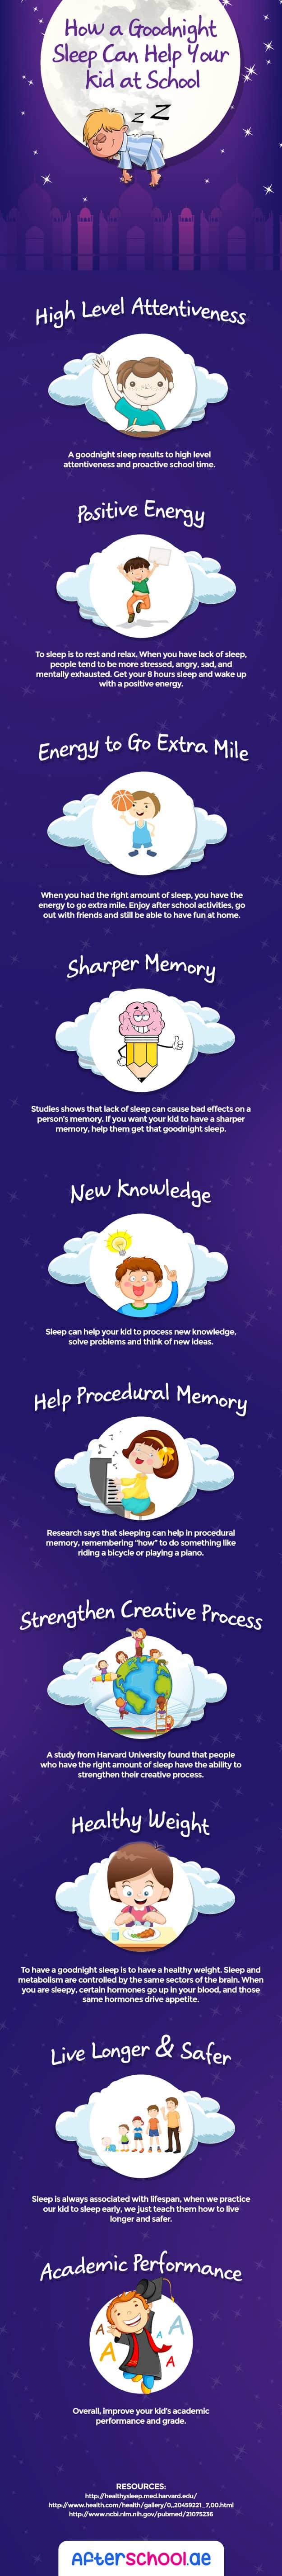 Good night sleep benefits infographic